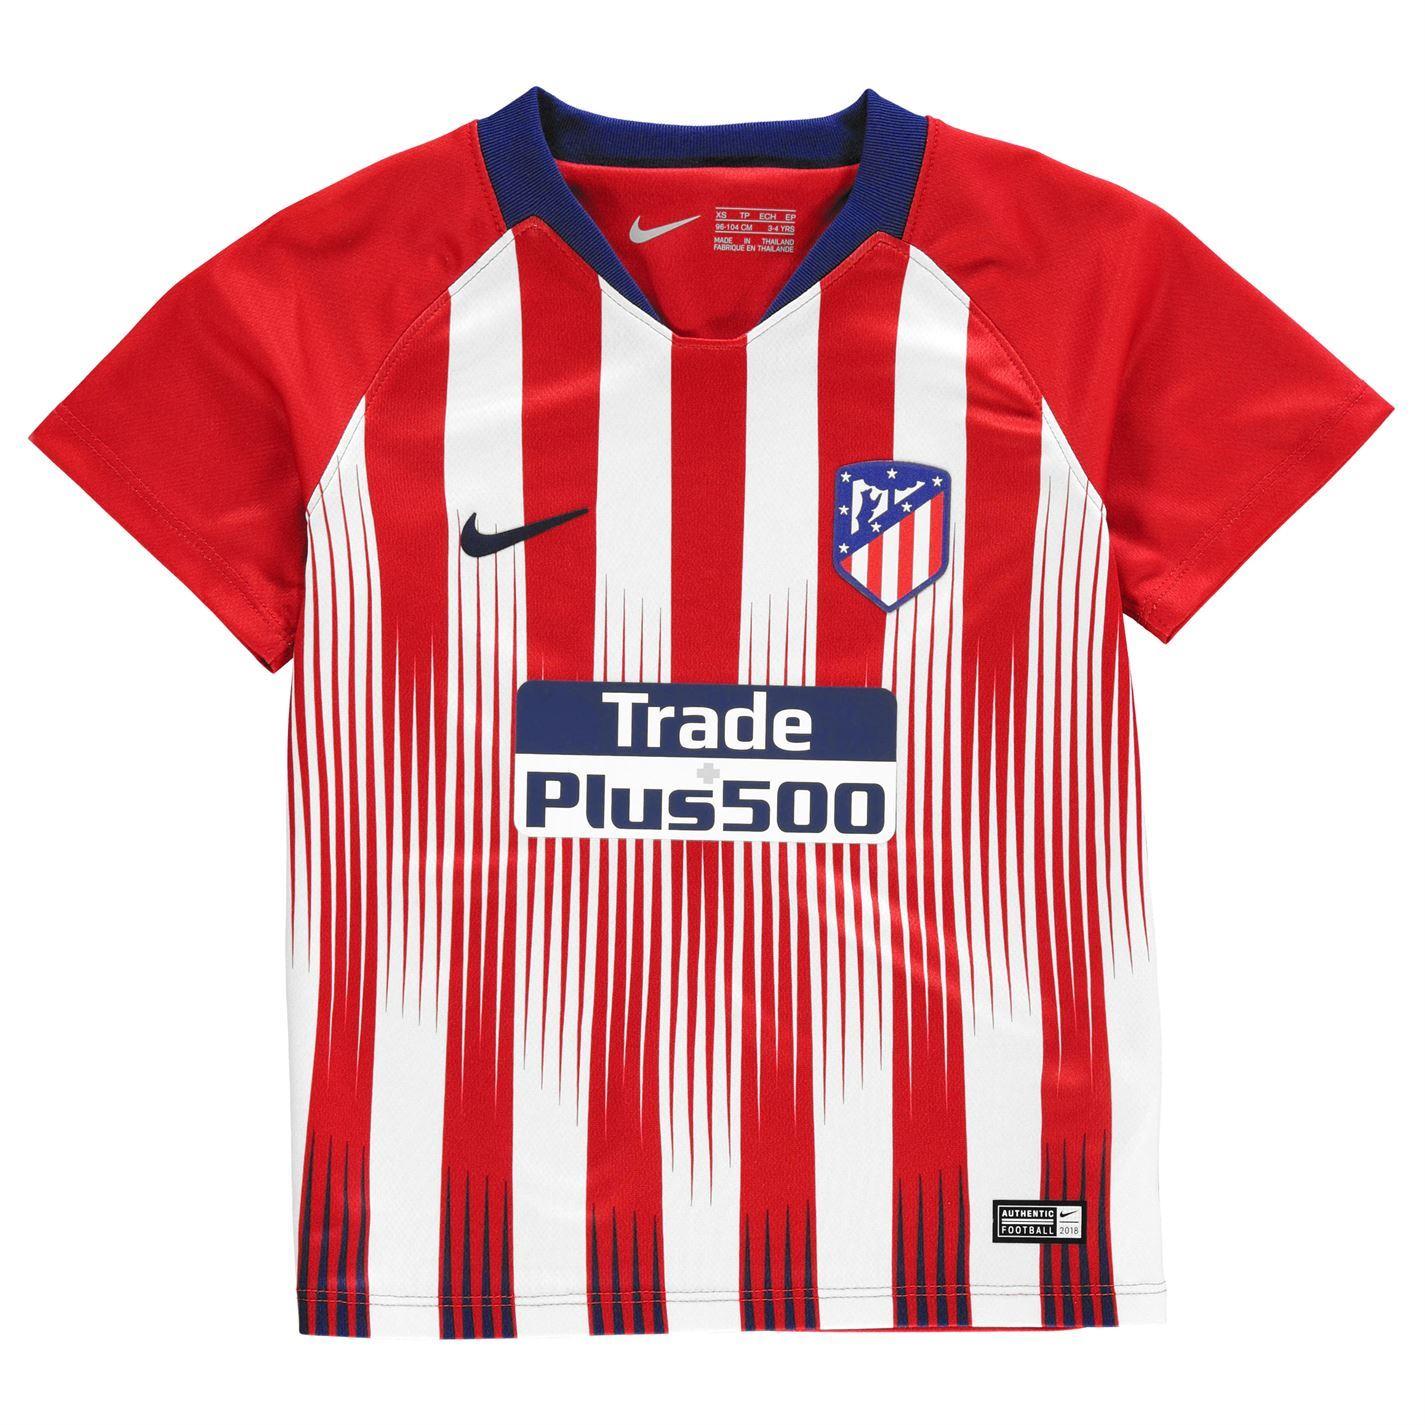 bcccc490b ... Nike Atletico Madrid Home Mini Kit 2018 19 Infants Red/Wht Football  Soccer Strip ...